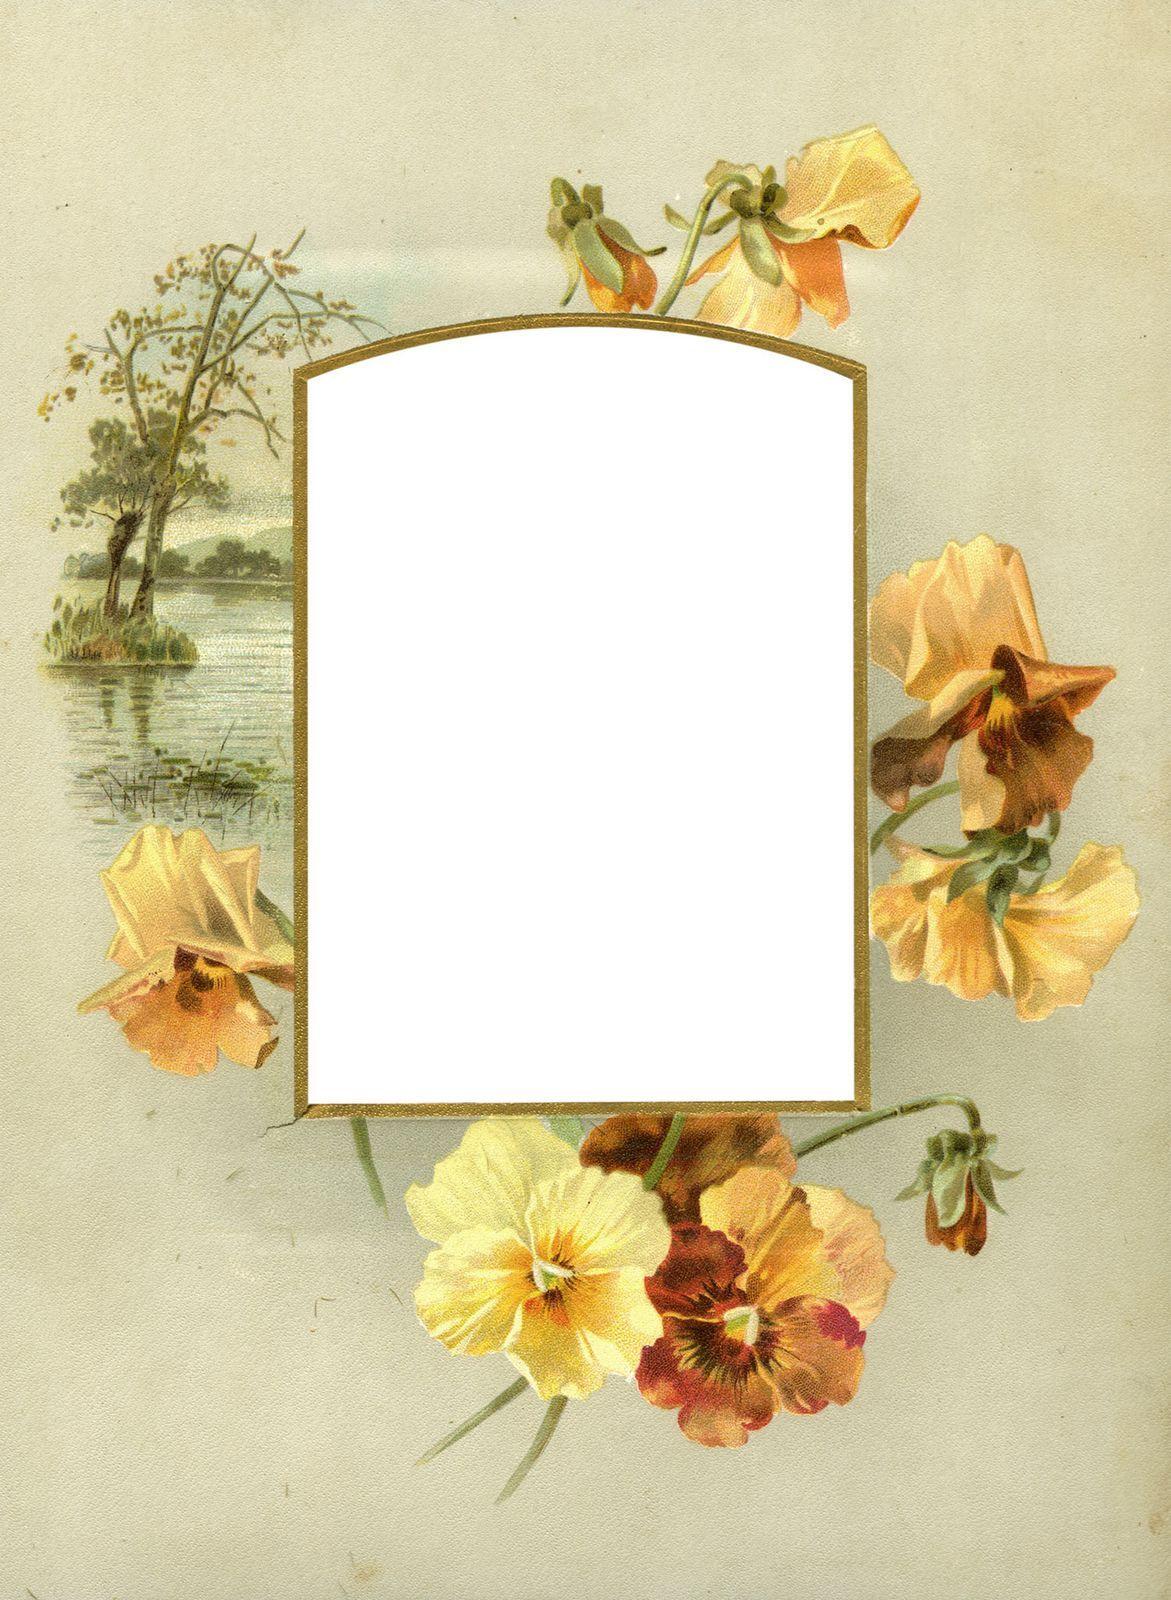 Настольная открытка рамка открытка винтаж